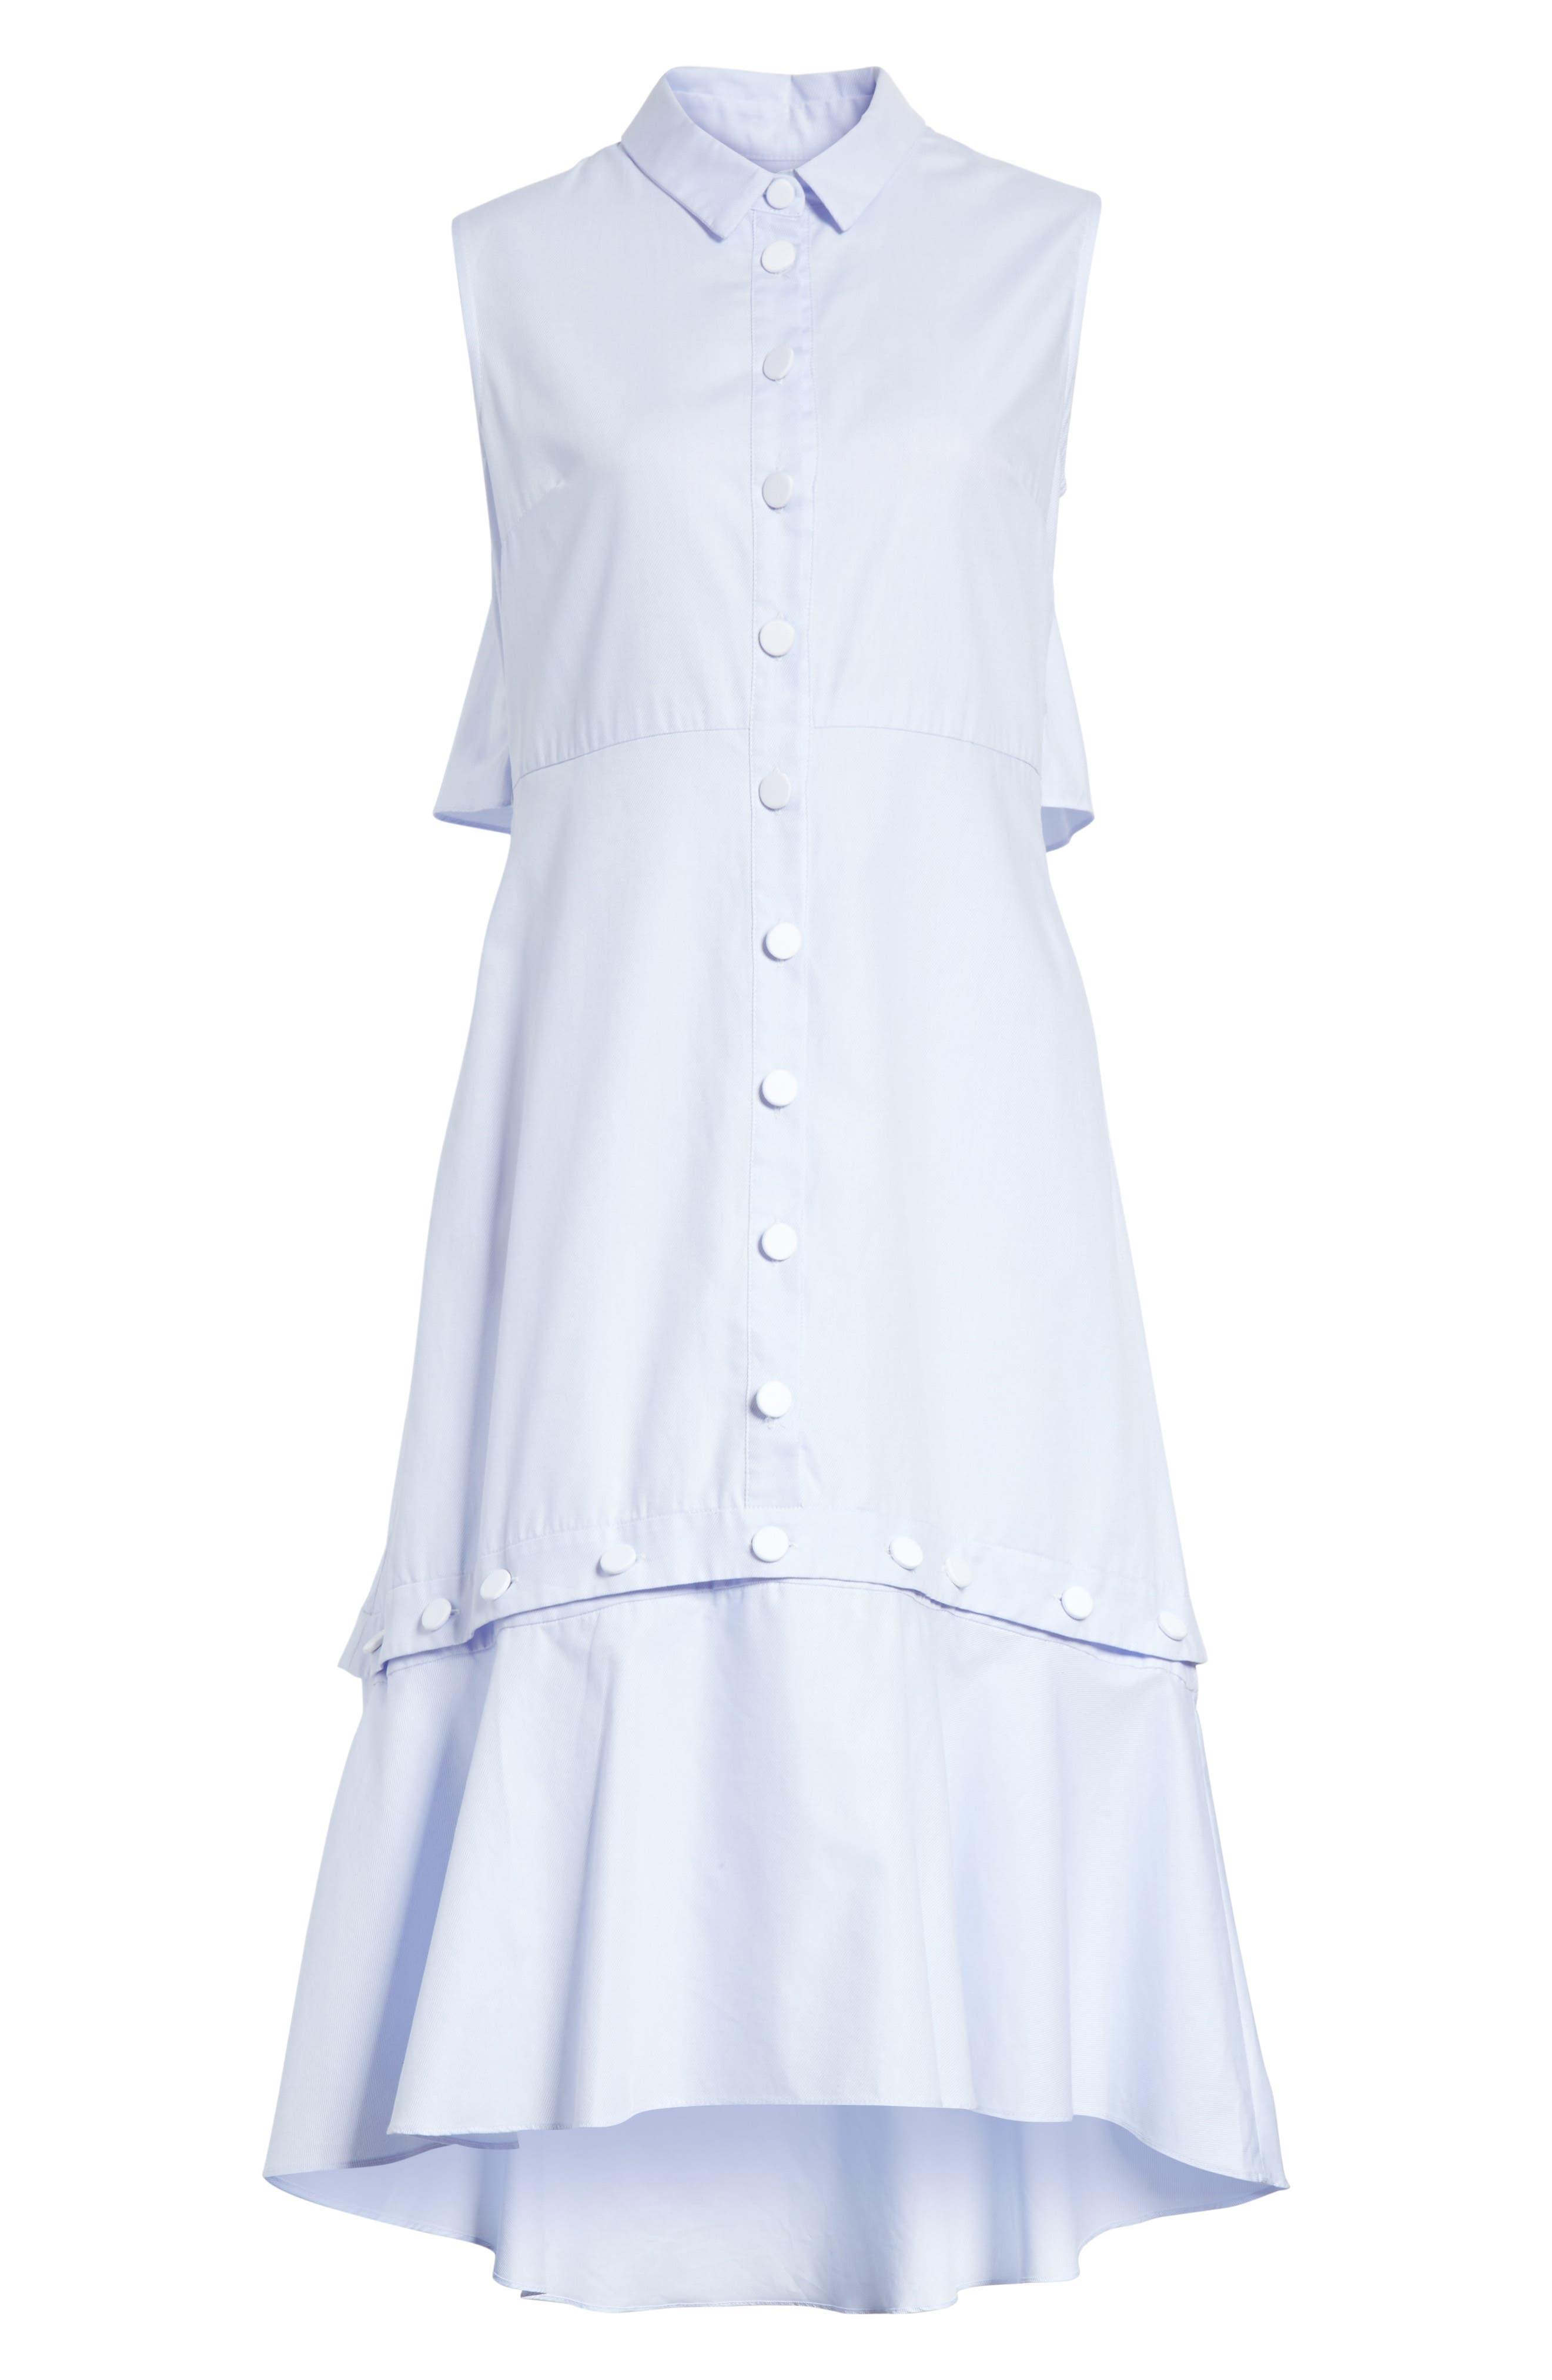 Prose & Poetry Rosen Midi Shirtdress,                             Alternate thumbnail 6, color,                             Bubble Blue